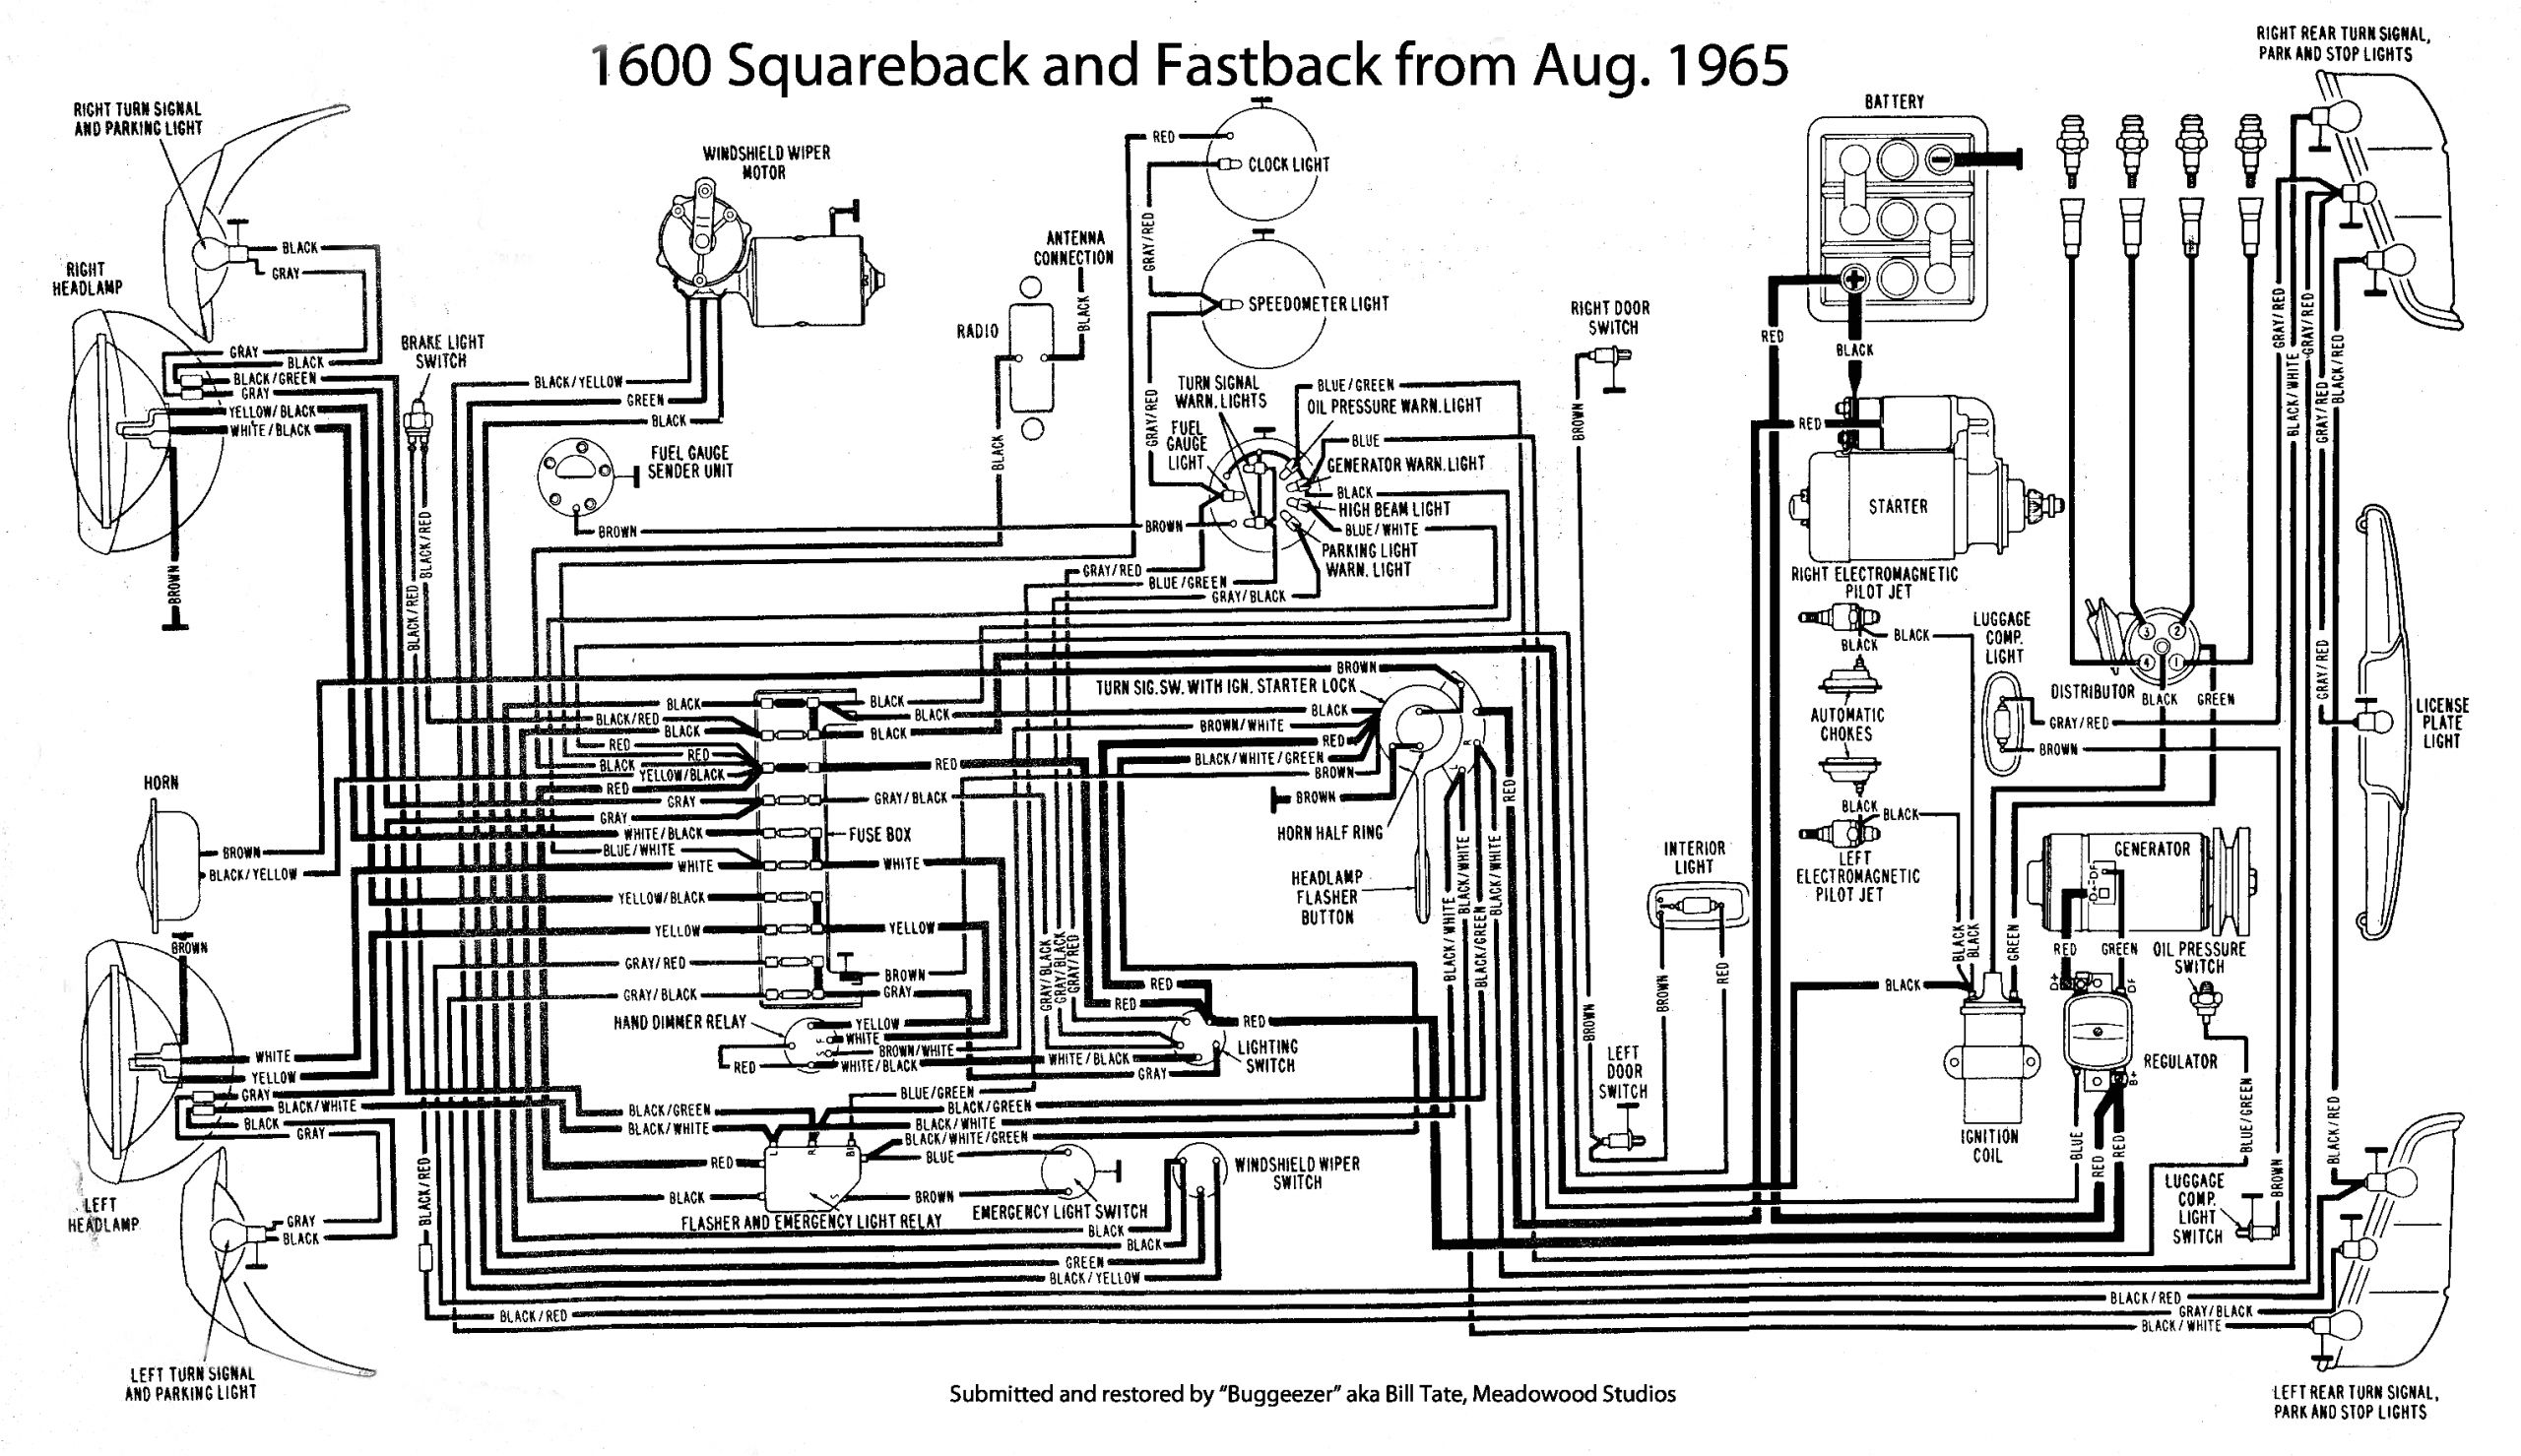 type3 squareback fastback 1600 motors jpg